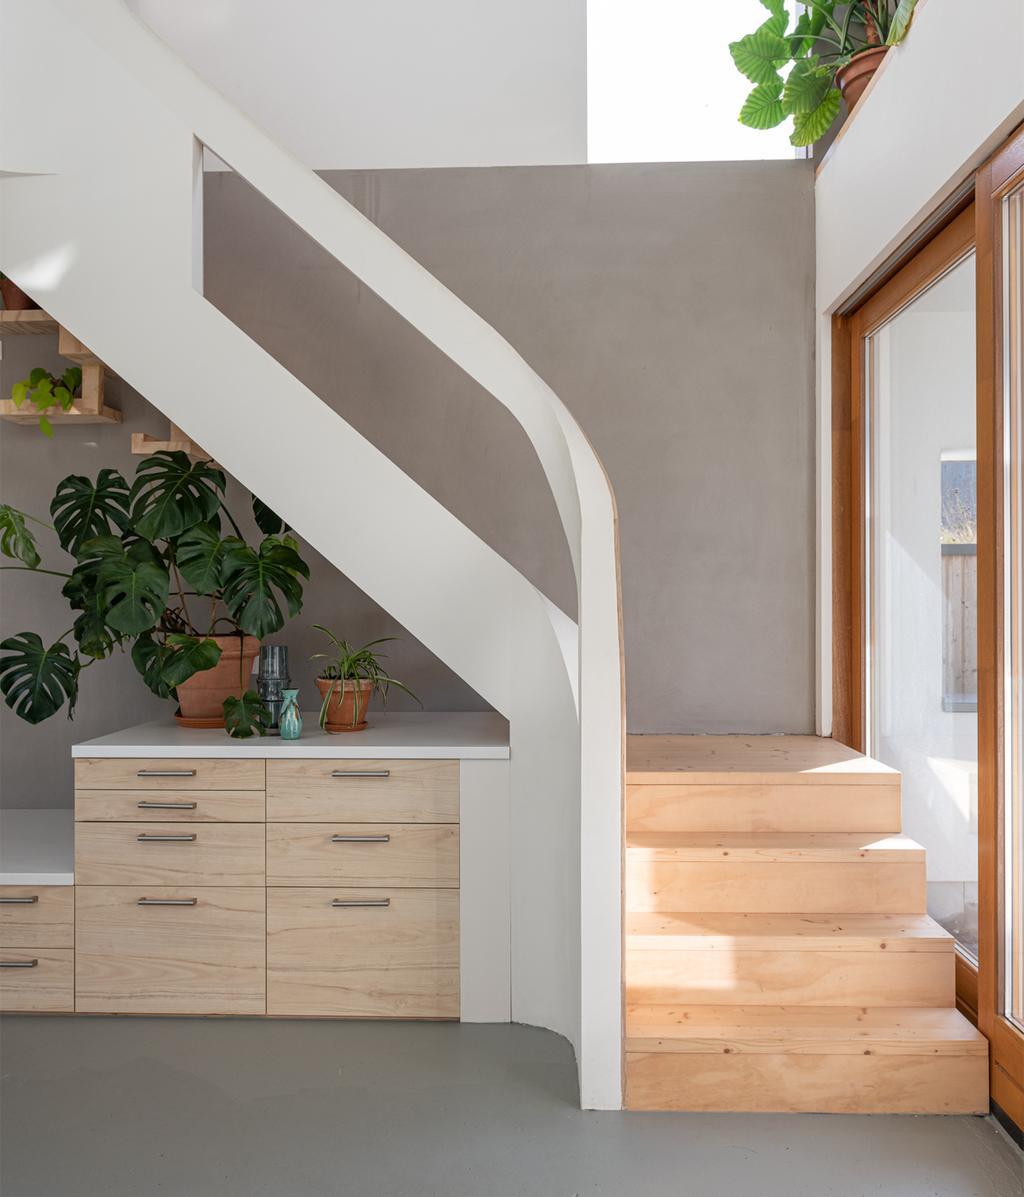 Basic interieur | Trap | vtwonen 01-2021